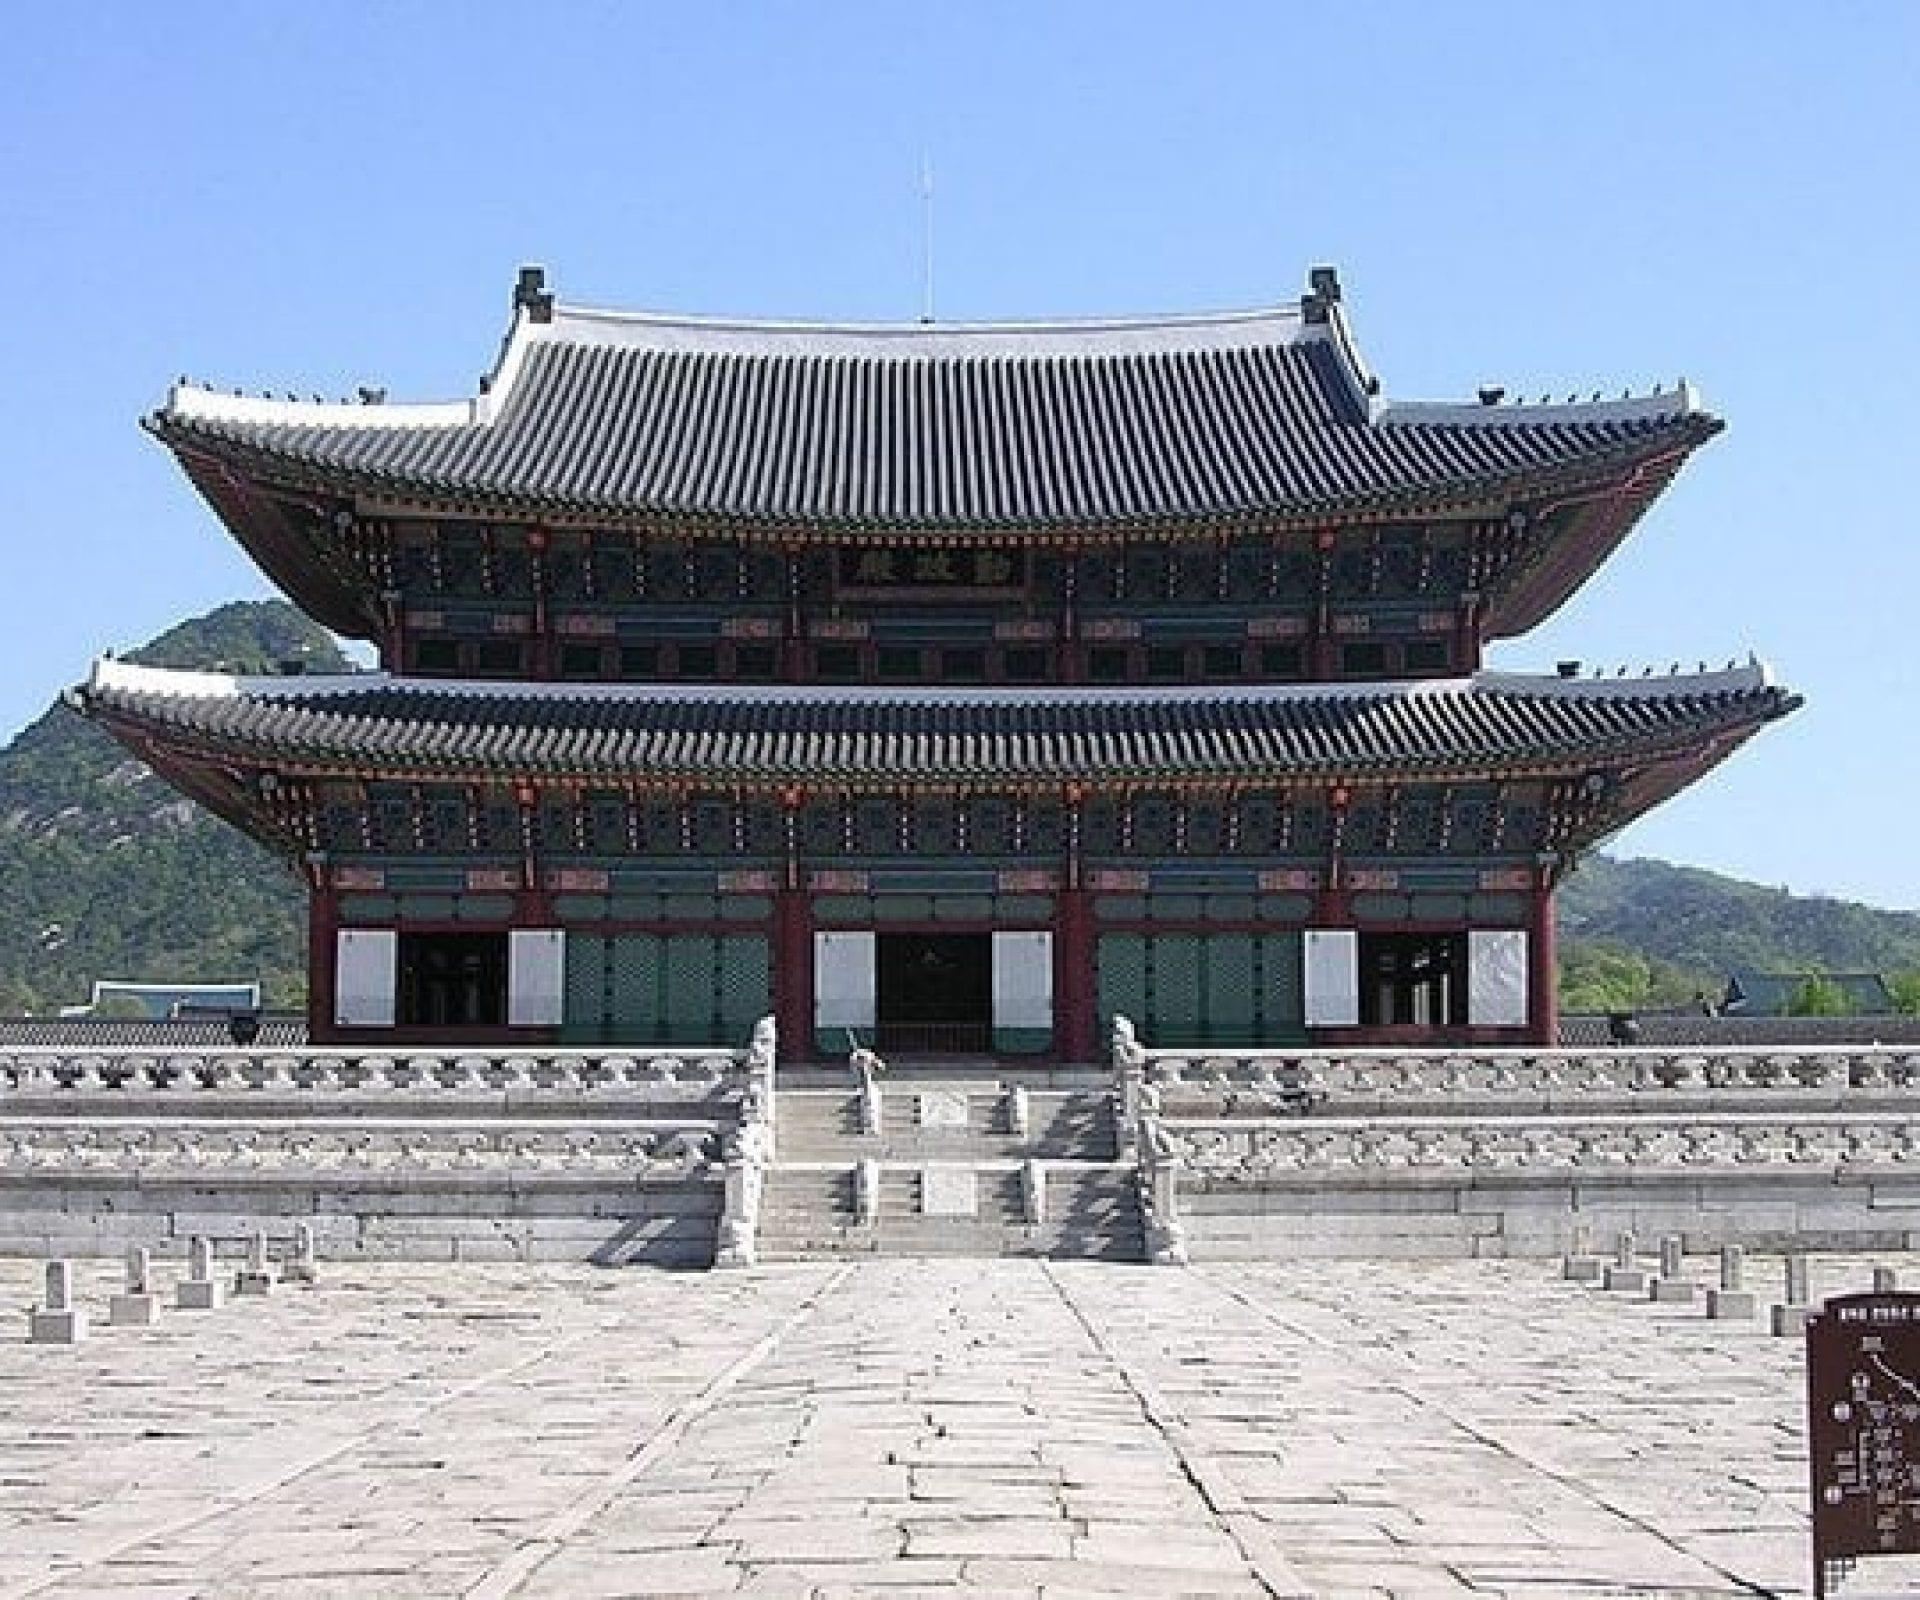 Gyeongbokgung Palace | Jongno-gu, Seoul